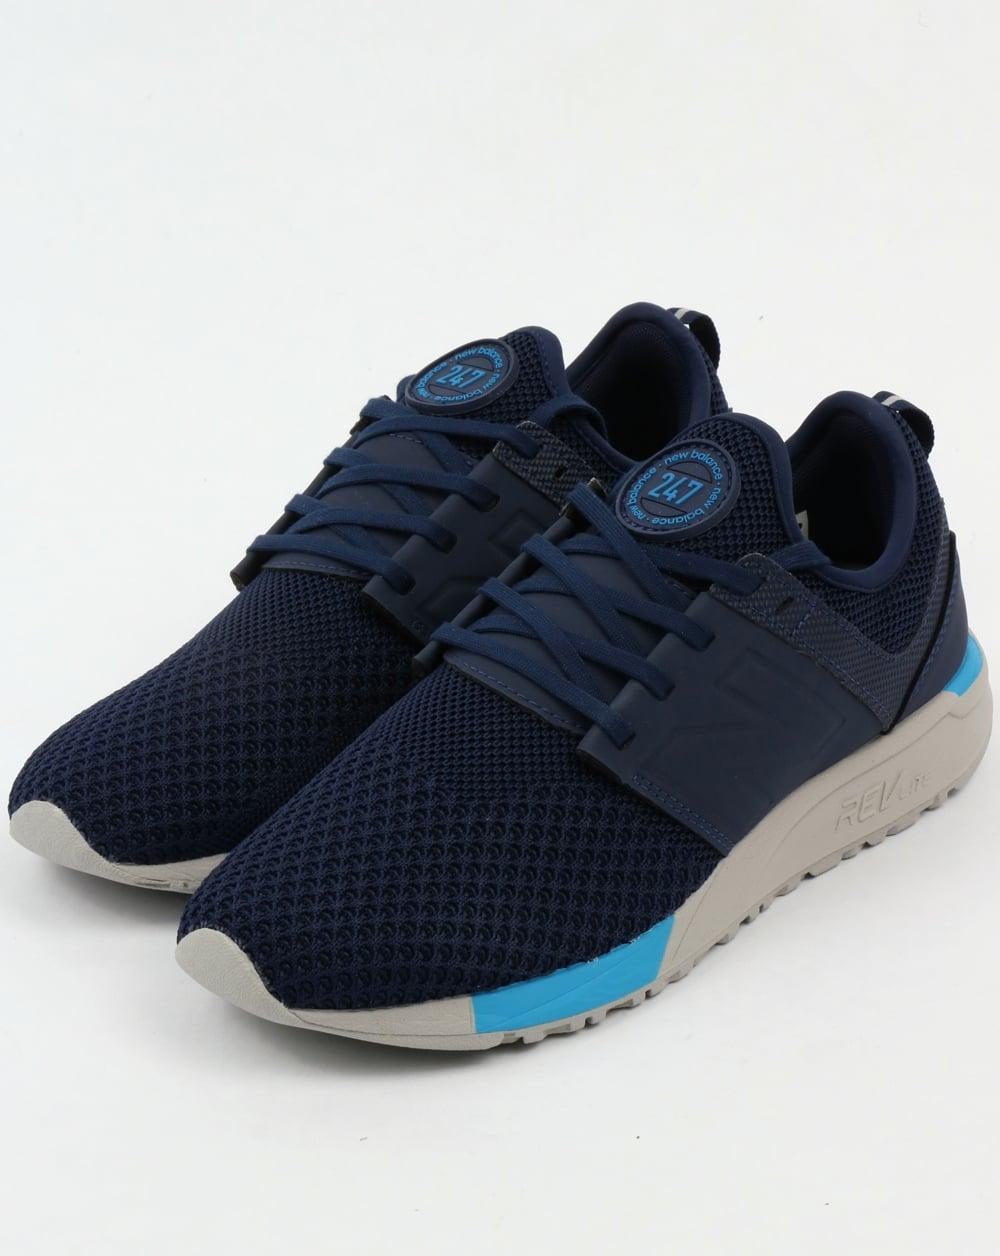 New Balance 247 Sport Trainers Navy/blue